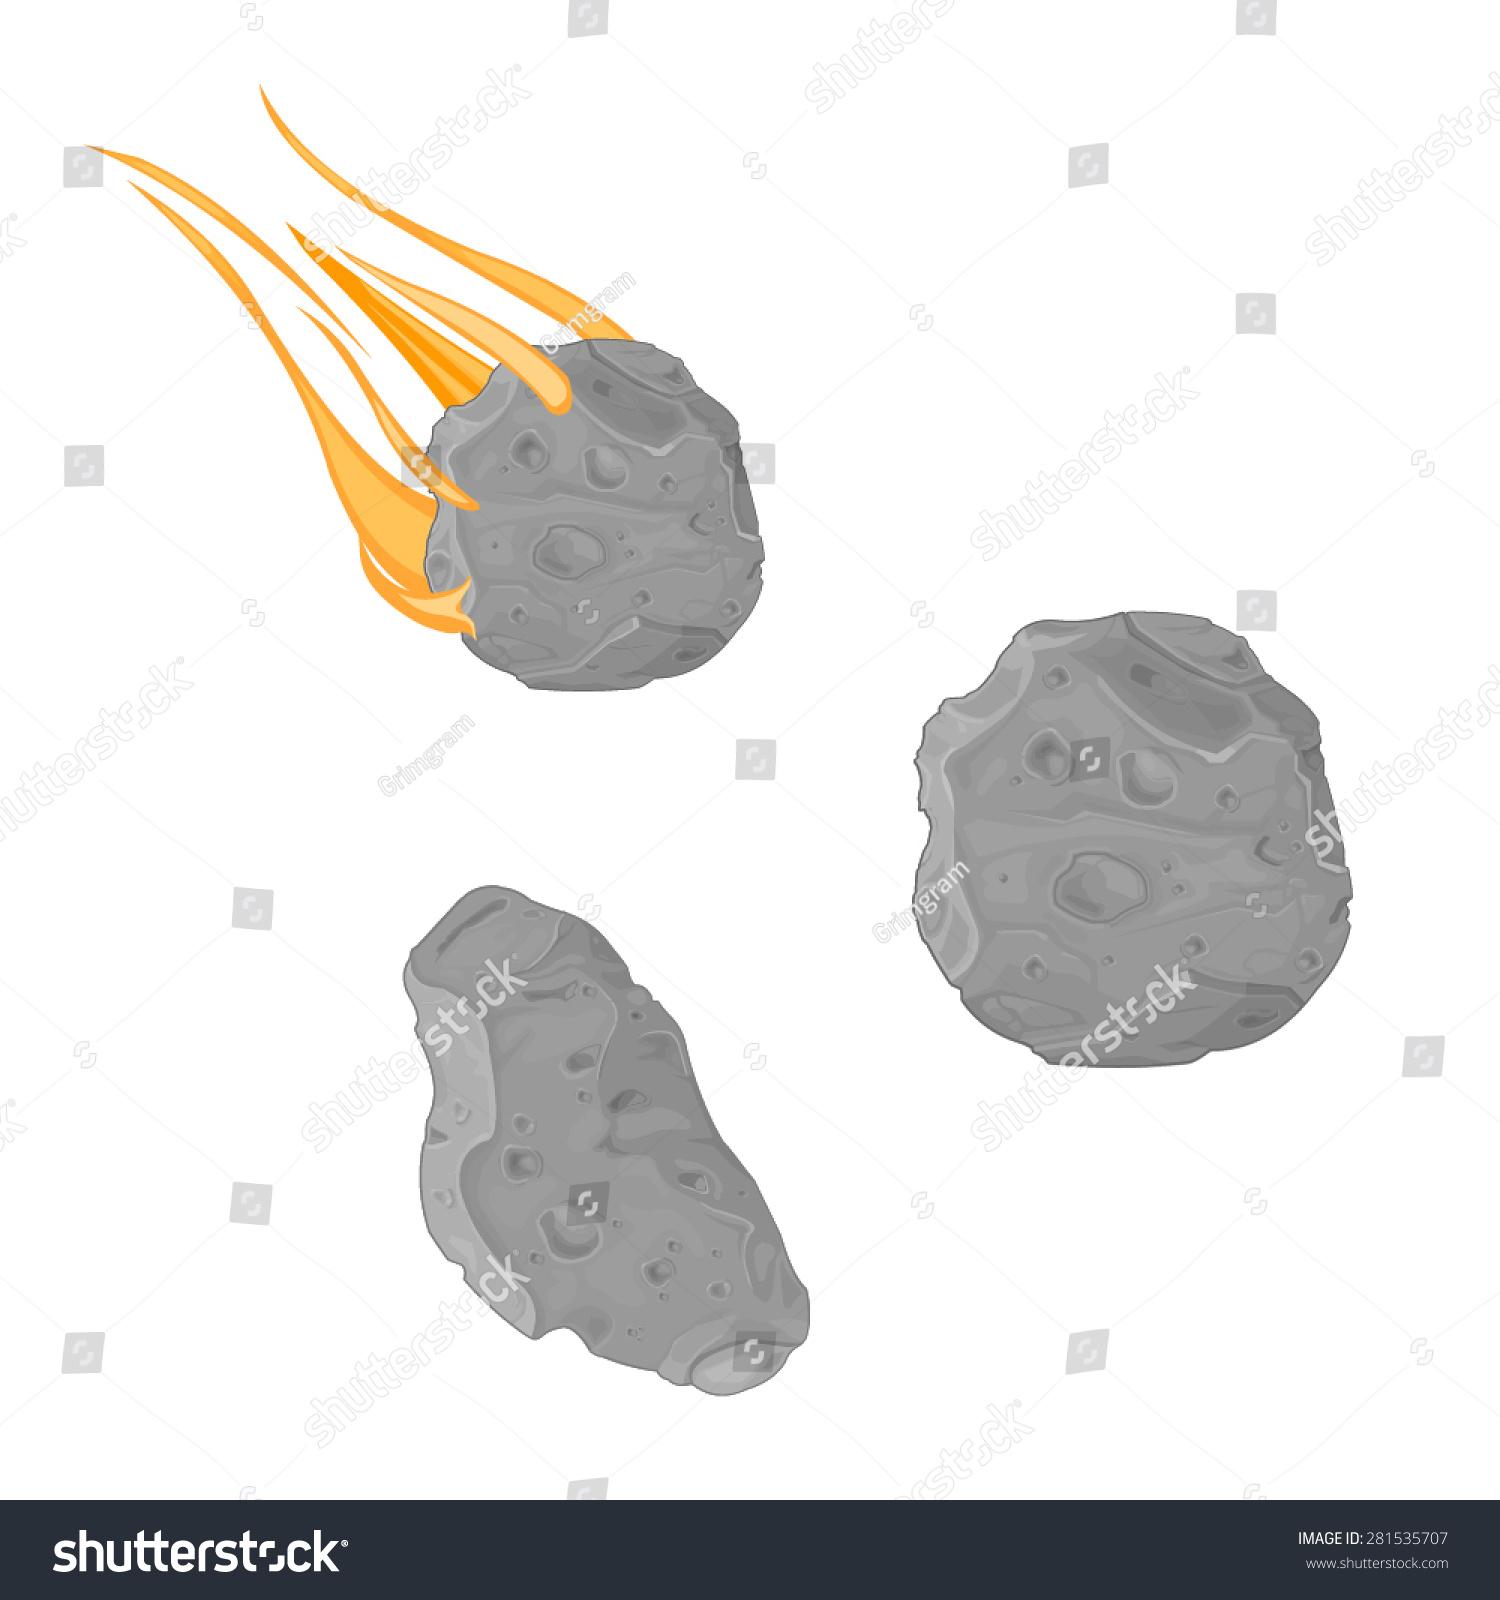 asteroid clip - photo #47